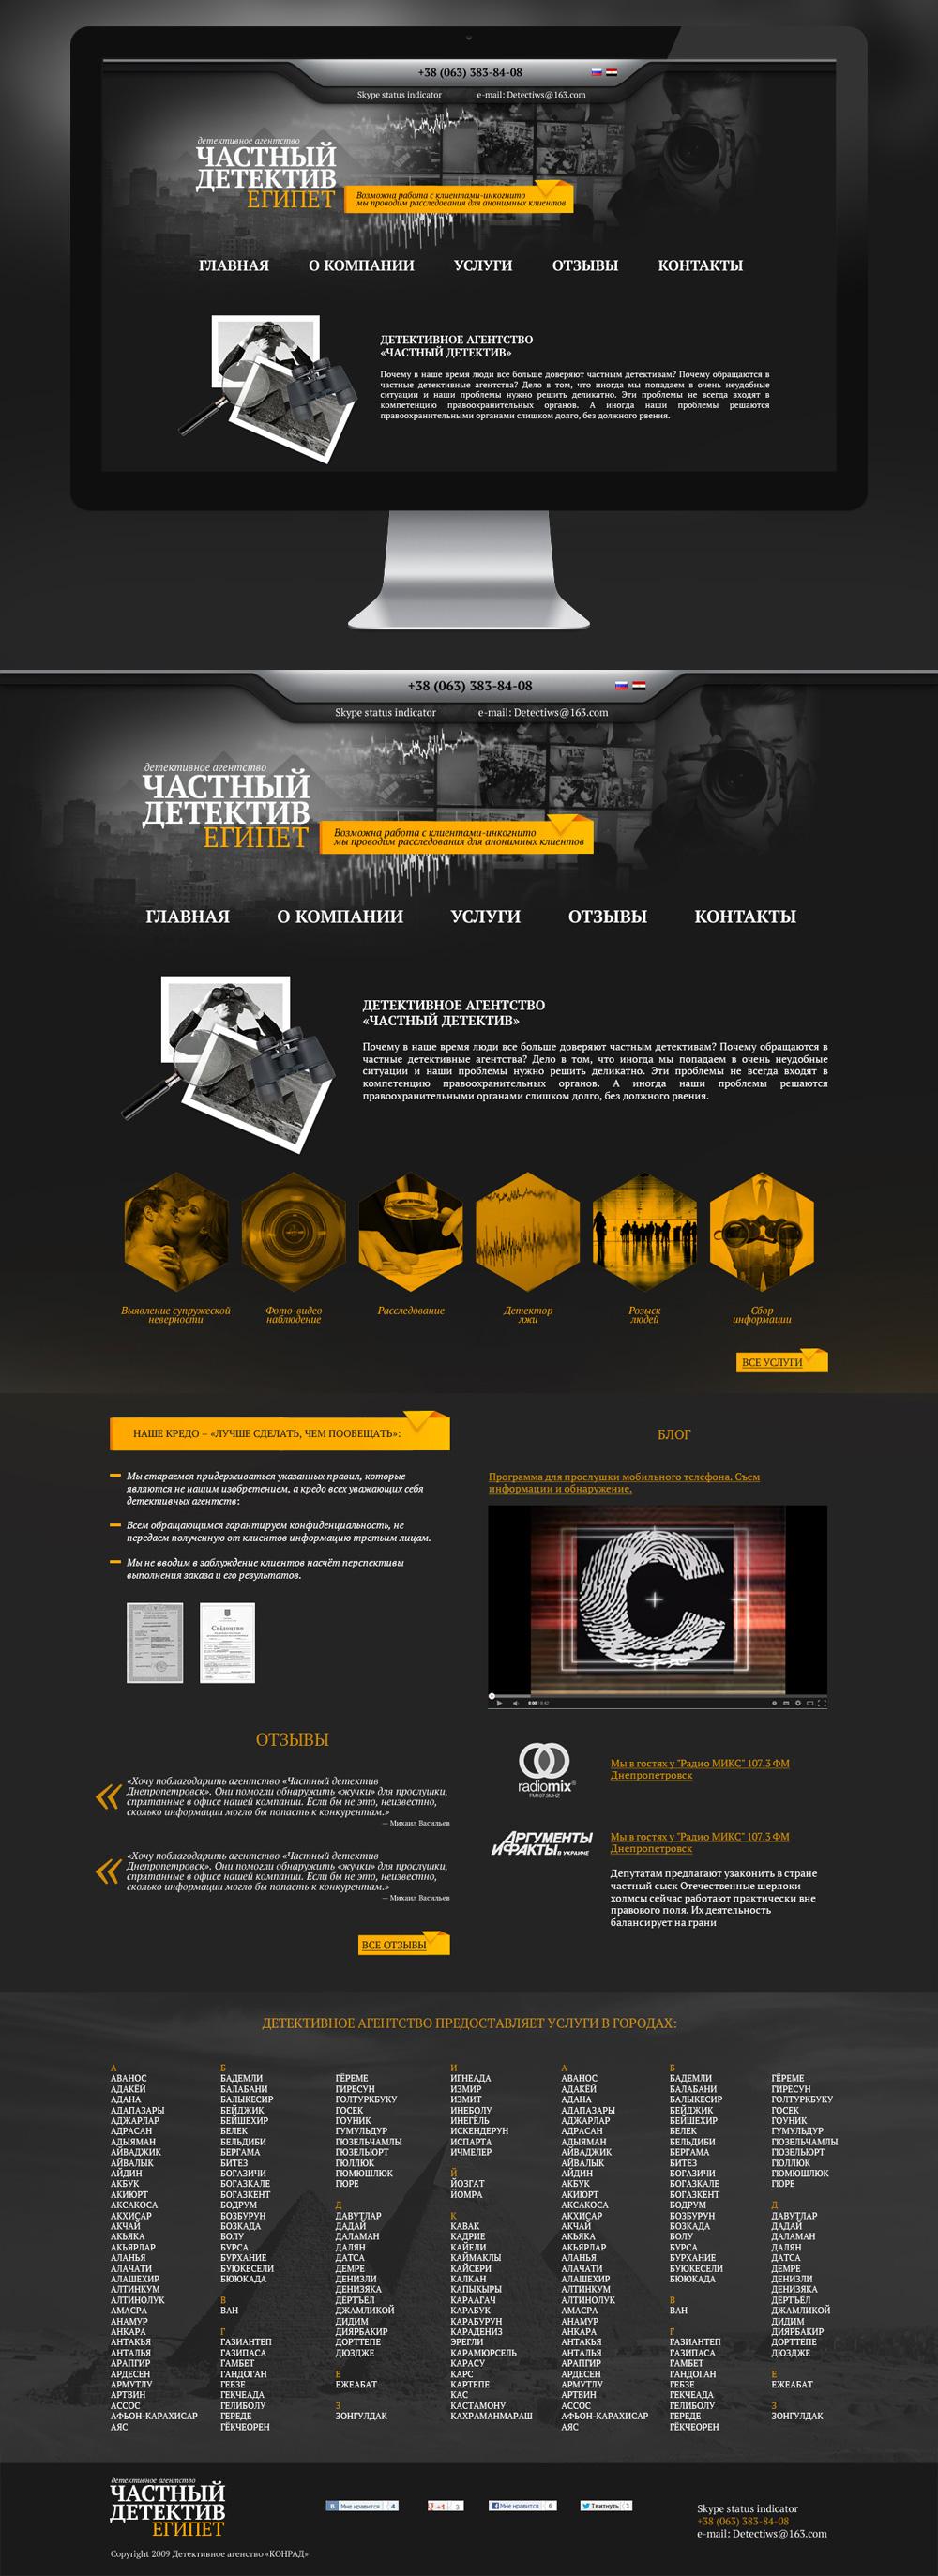 Дизайн сайта для детектива